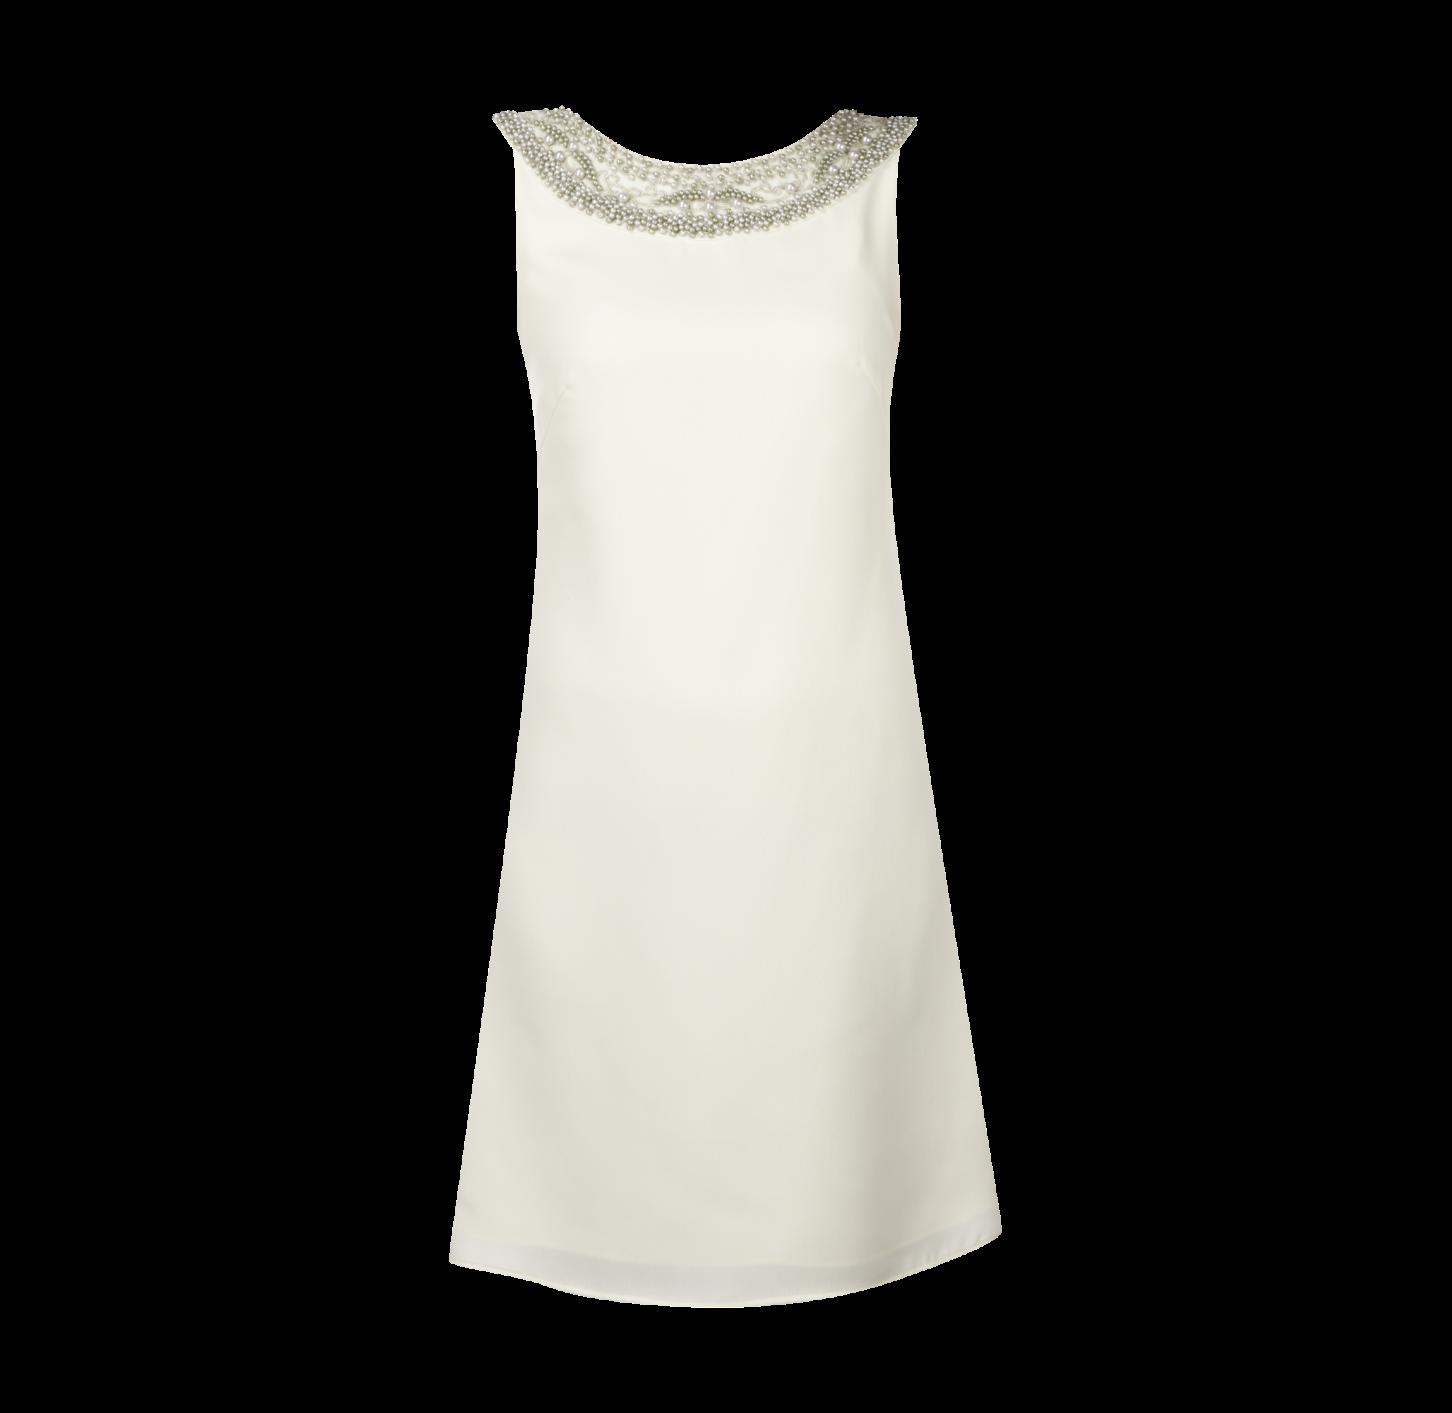 DIBARI Cocktailkleid mit Perlenbesatz #beaded #embellished #dress ...